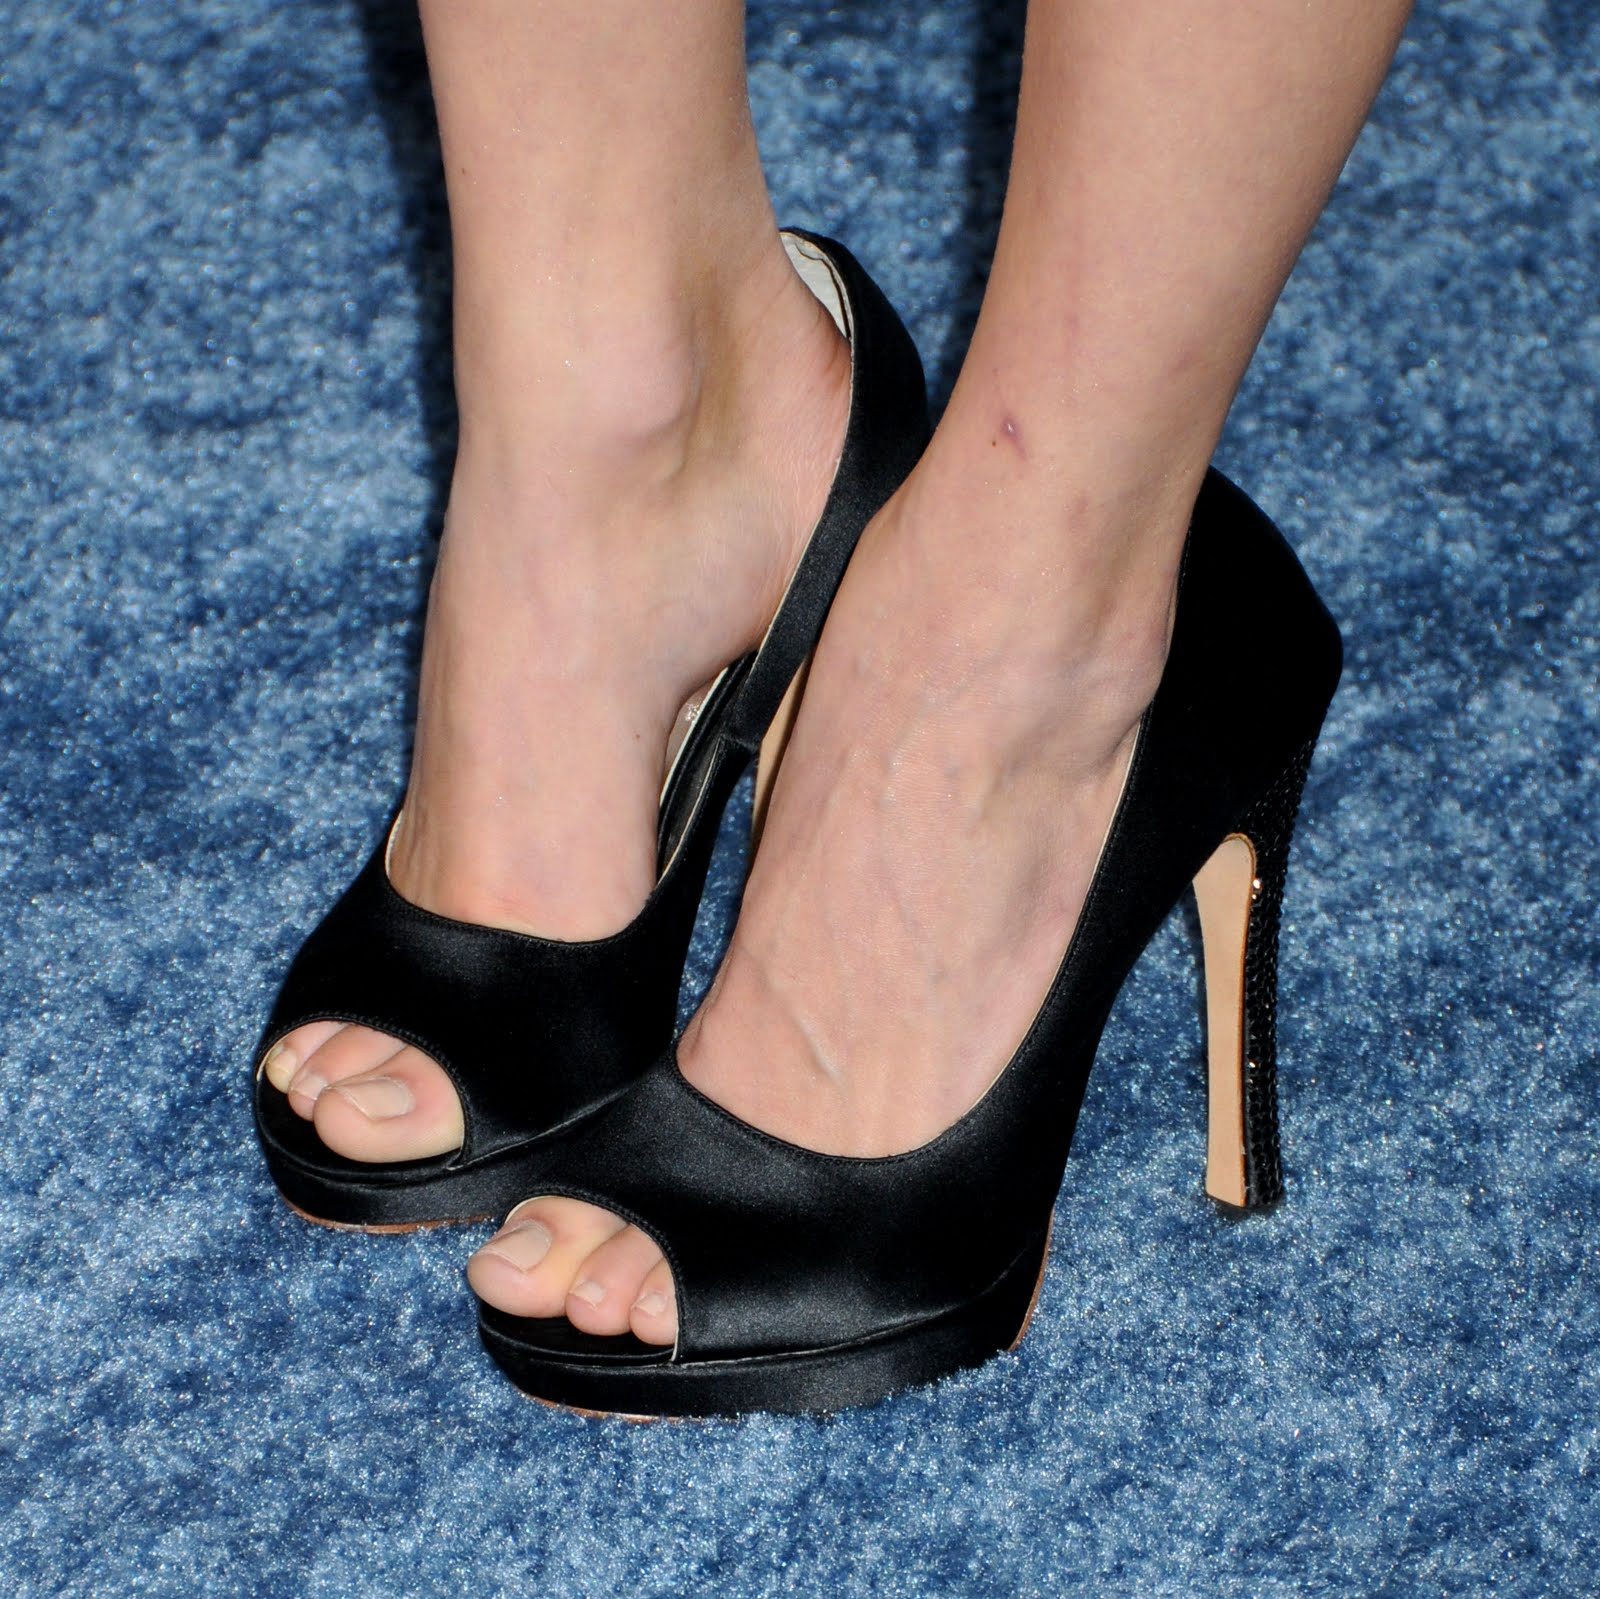 Jennifer Finnigan Feet pics style: emmy rossum feet